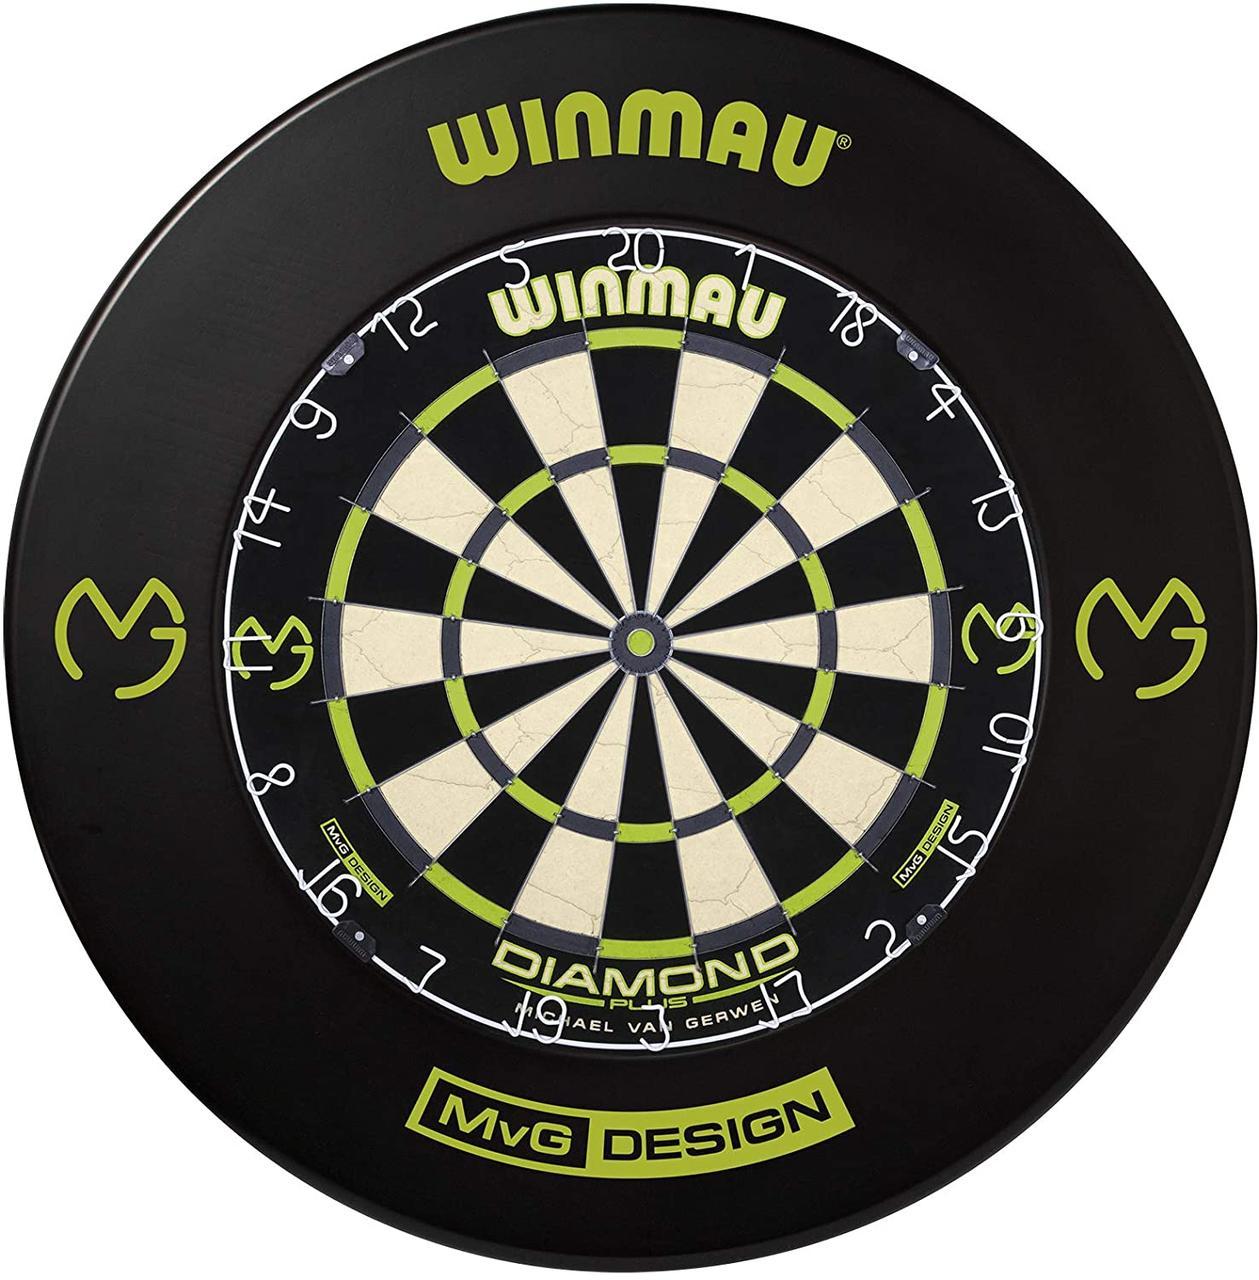 Фирменный набор для игры в дартс MvG Winmau Англия